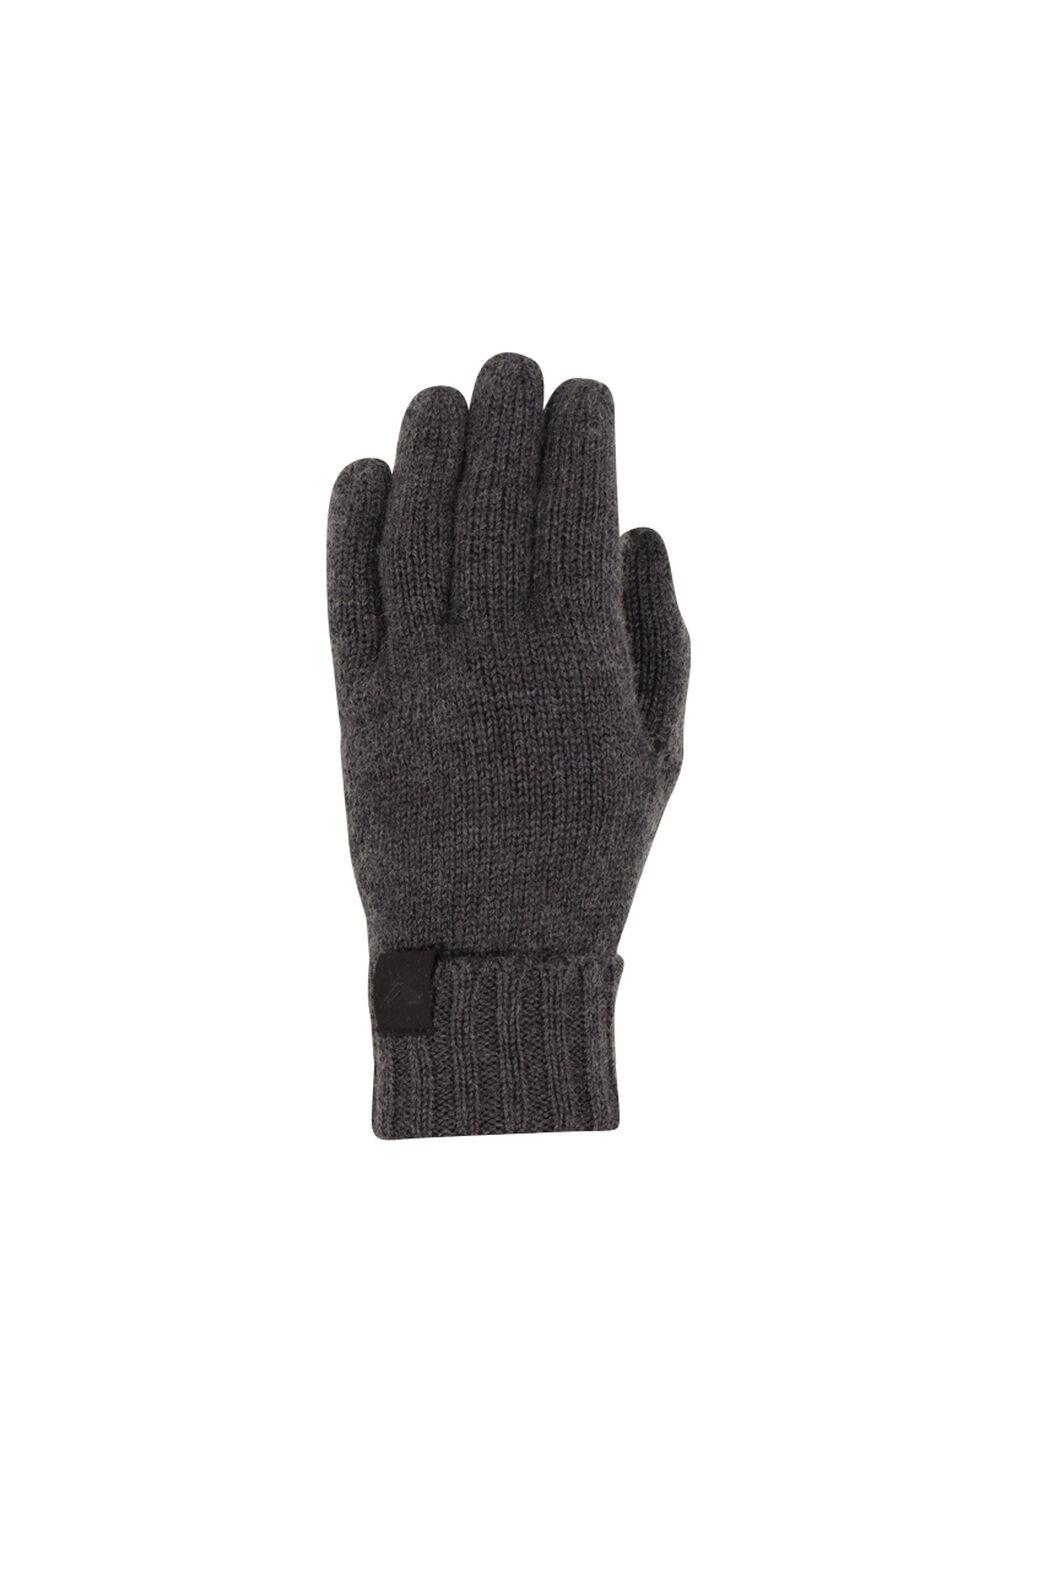 Macpac Merino Knit Gloves V2, Charcoal Melange, hi-res